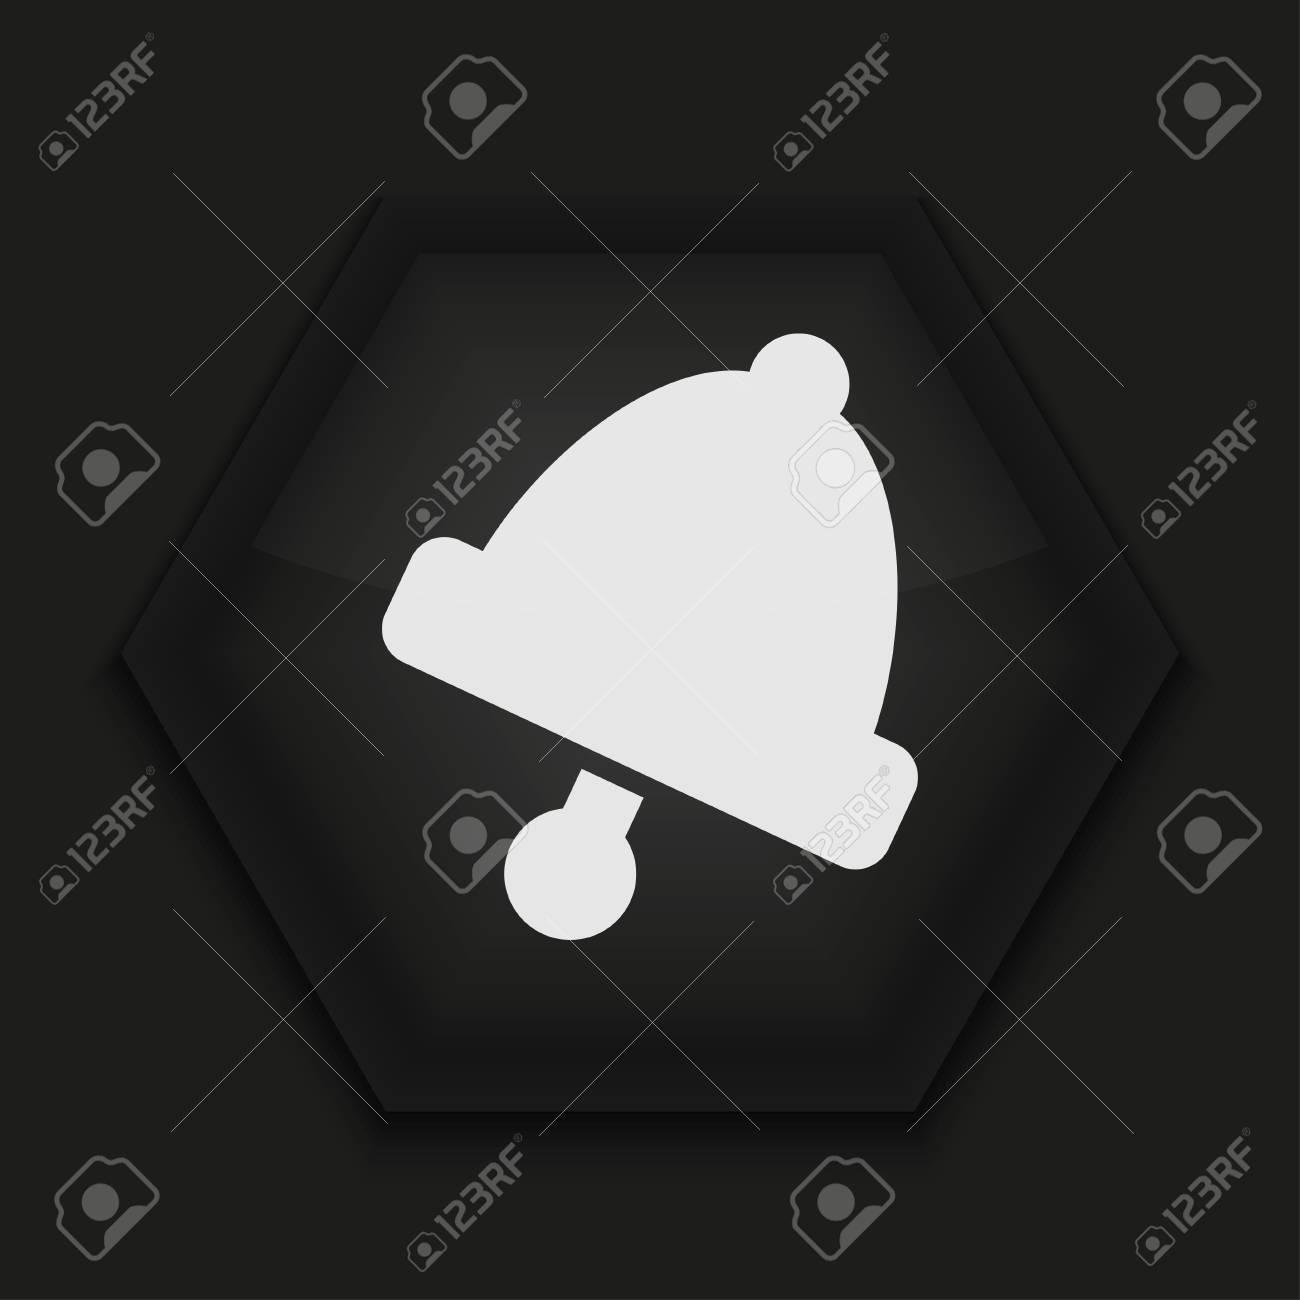 Vector creative icon on black background. Eps10 Stock Vector - 17273395